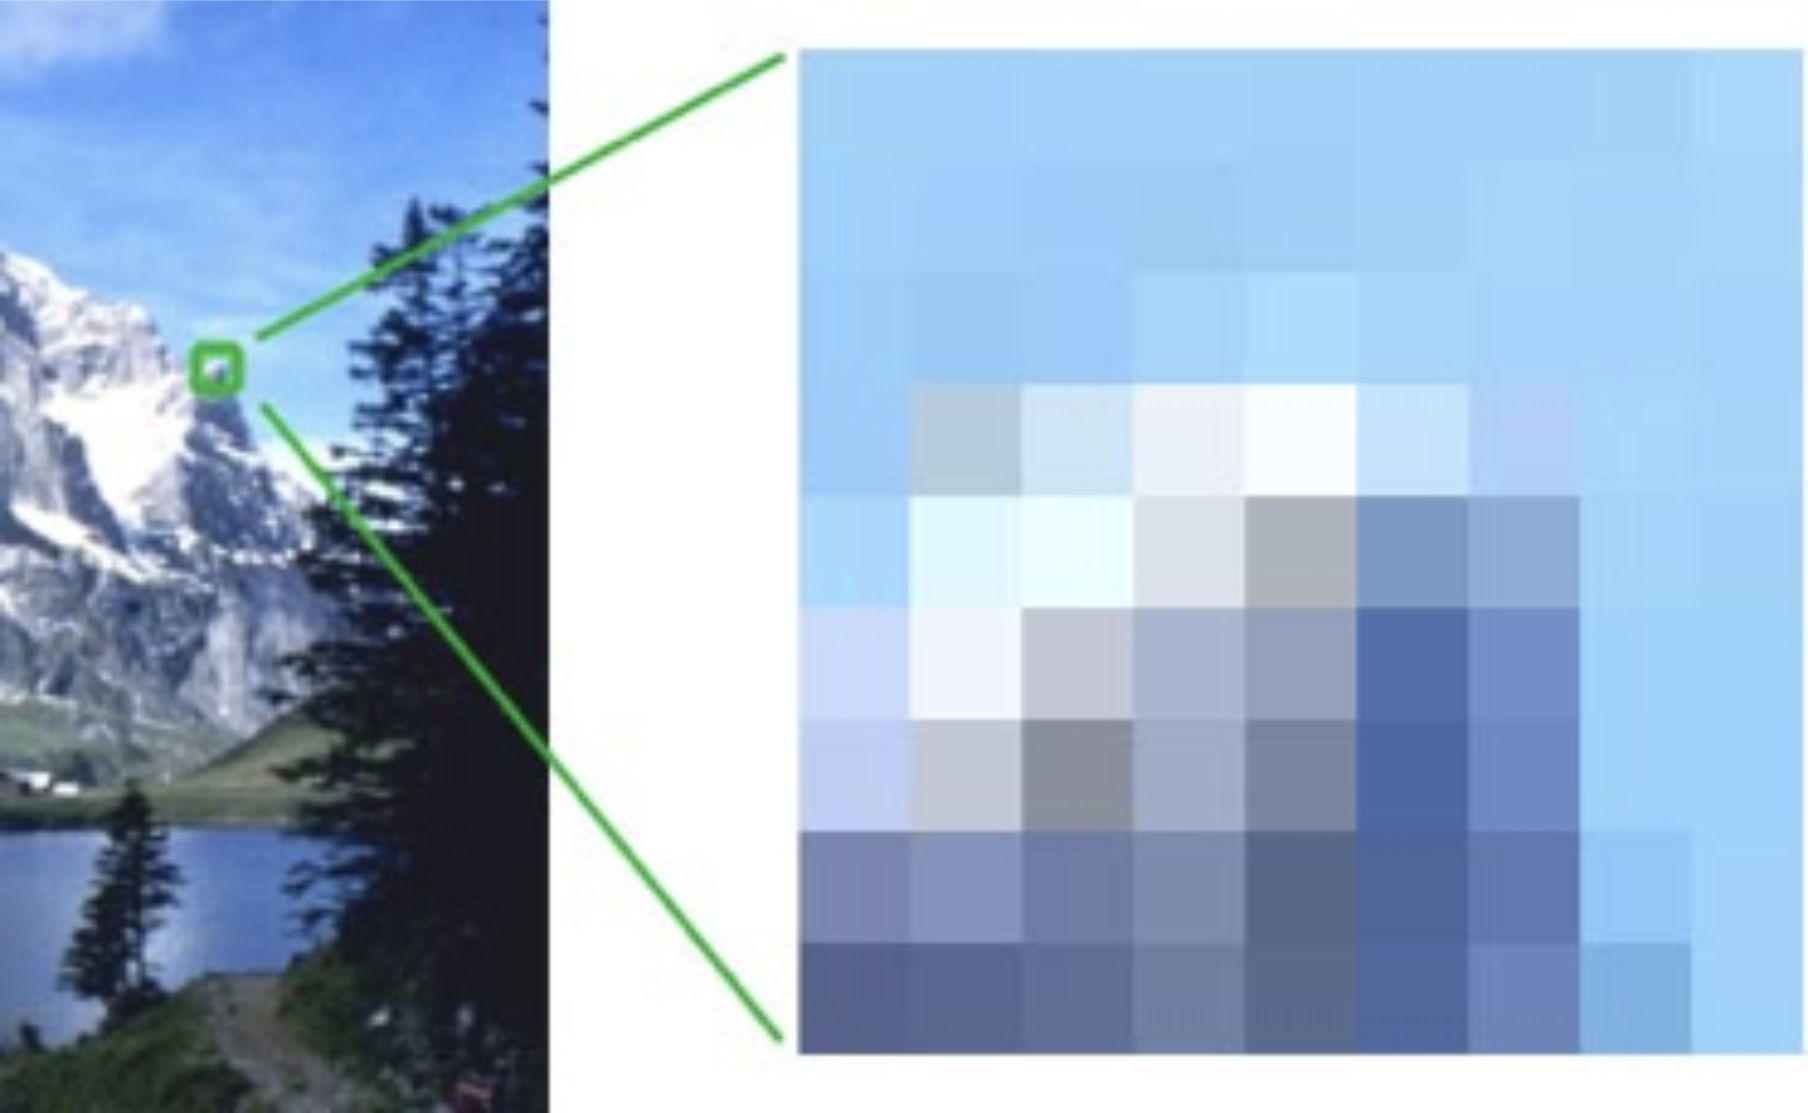 любите почему при увеличении фото видно пиксели захаровна оставила